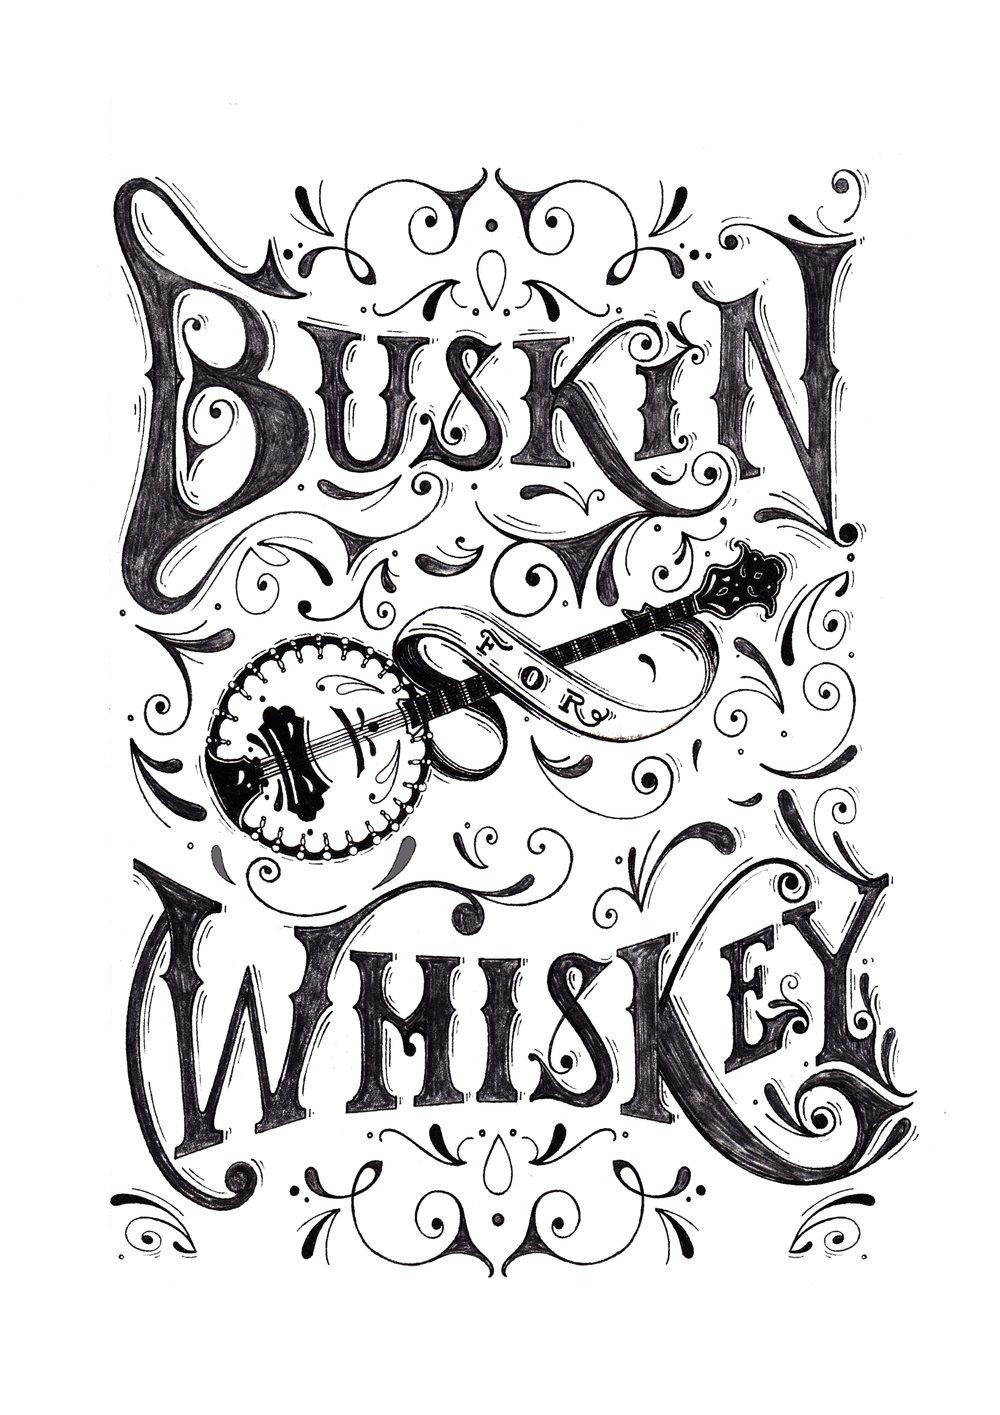 Buskin'For Whiskey - Nashville Typographic Illustration for Flag & Anthem Clothing,2016.